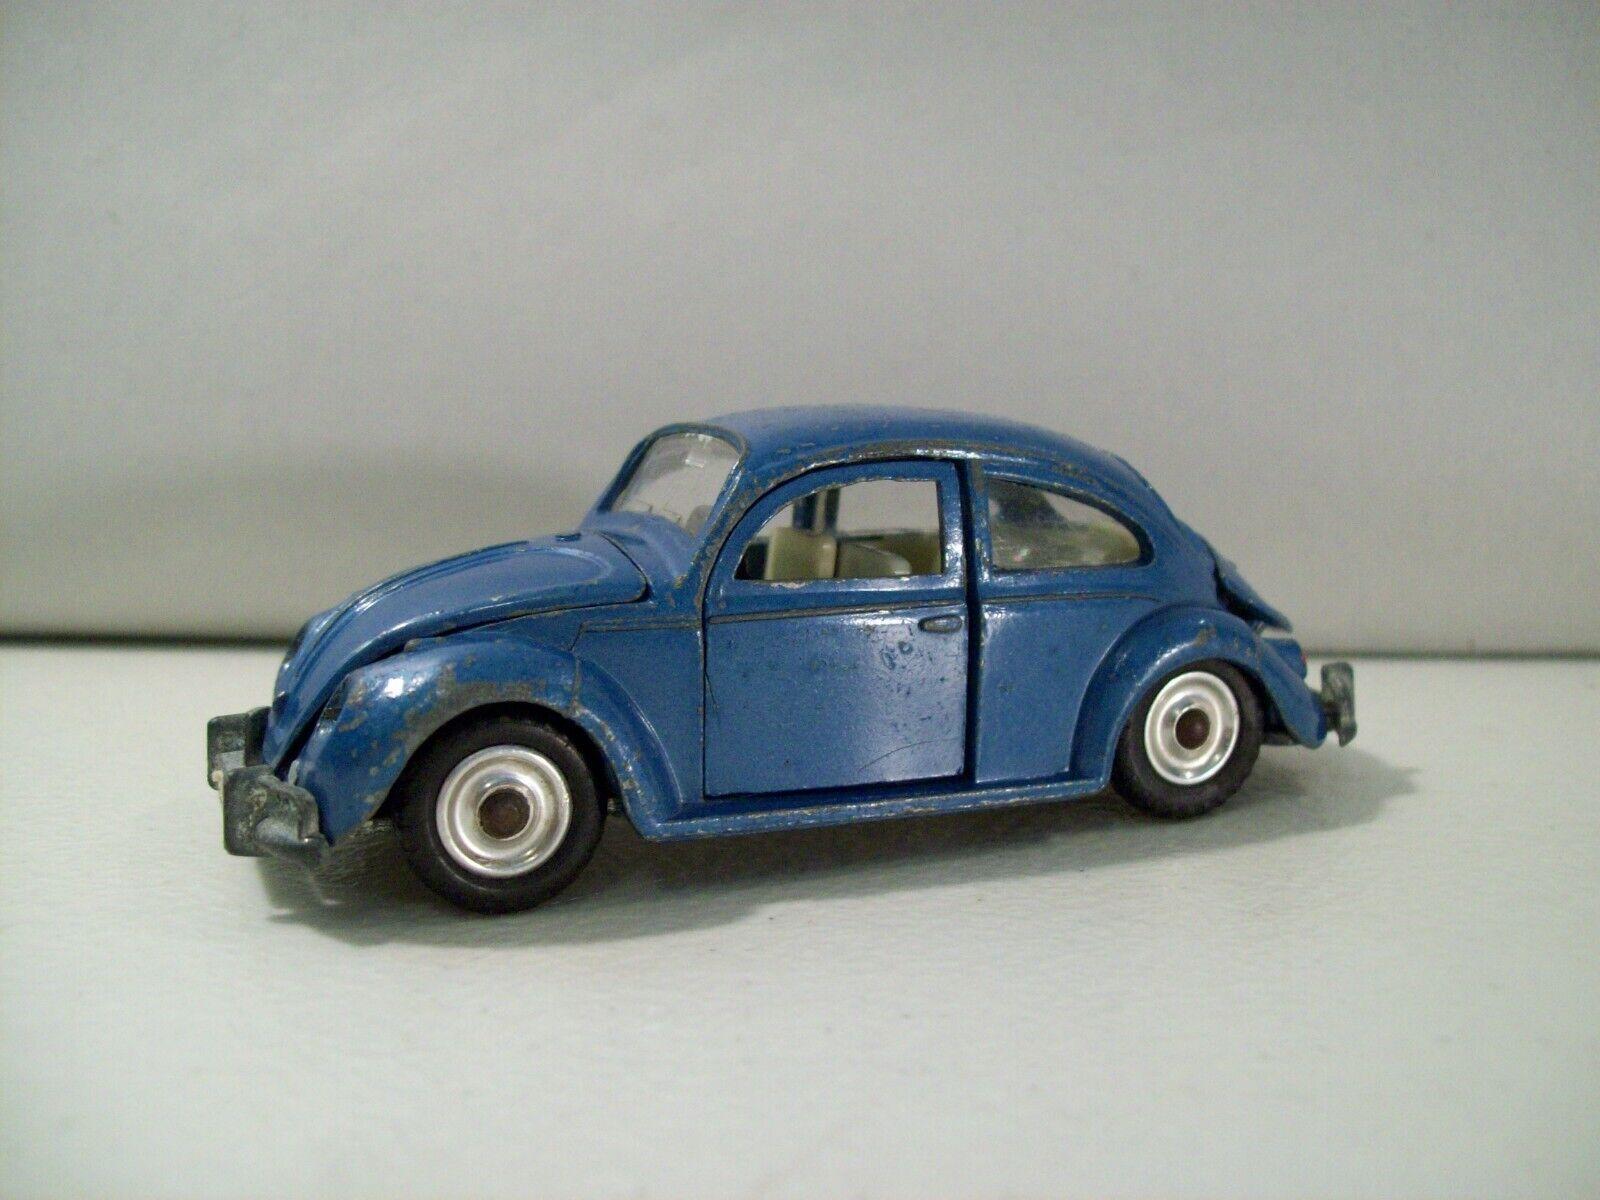 Vintage Dinky Juguetes Volkswagen De Luxe VW Beetle 129 Die Cast Auto Meccano England